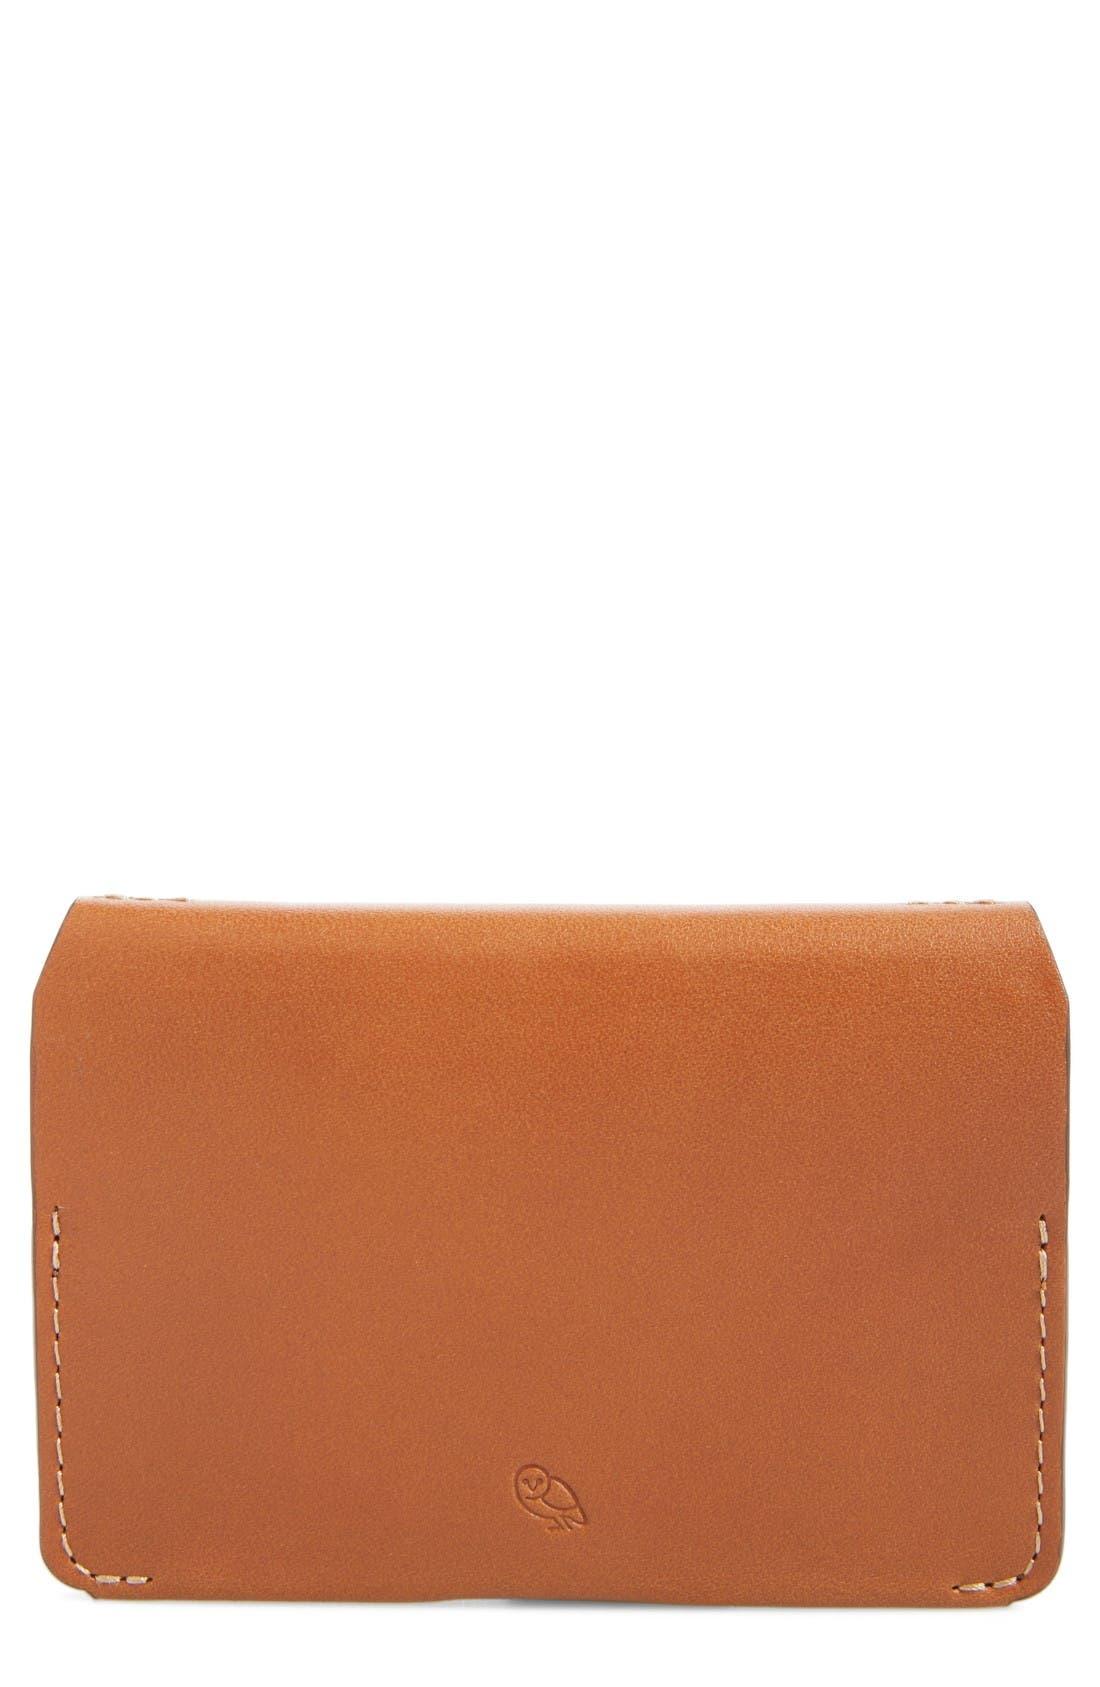 Leather Card Case,                         Main,                         color, Caramel